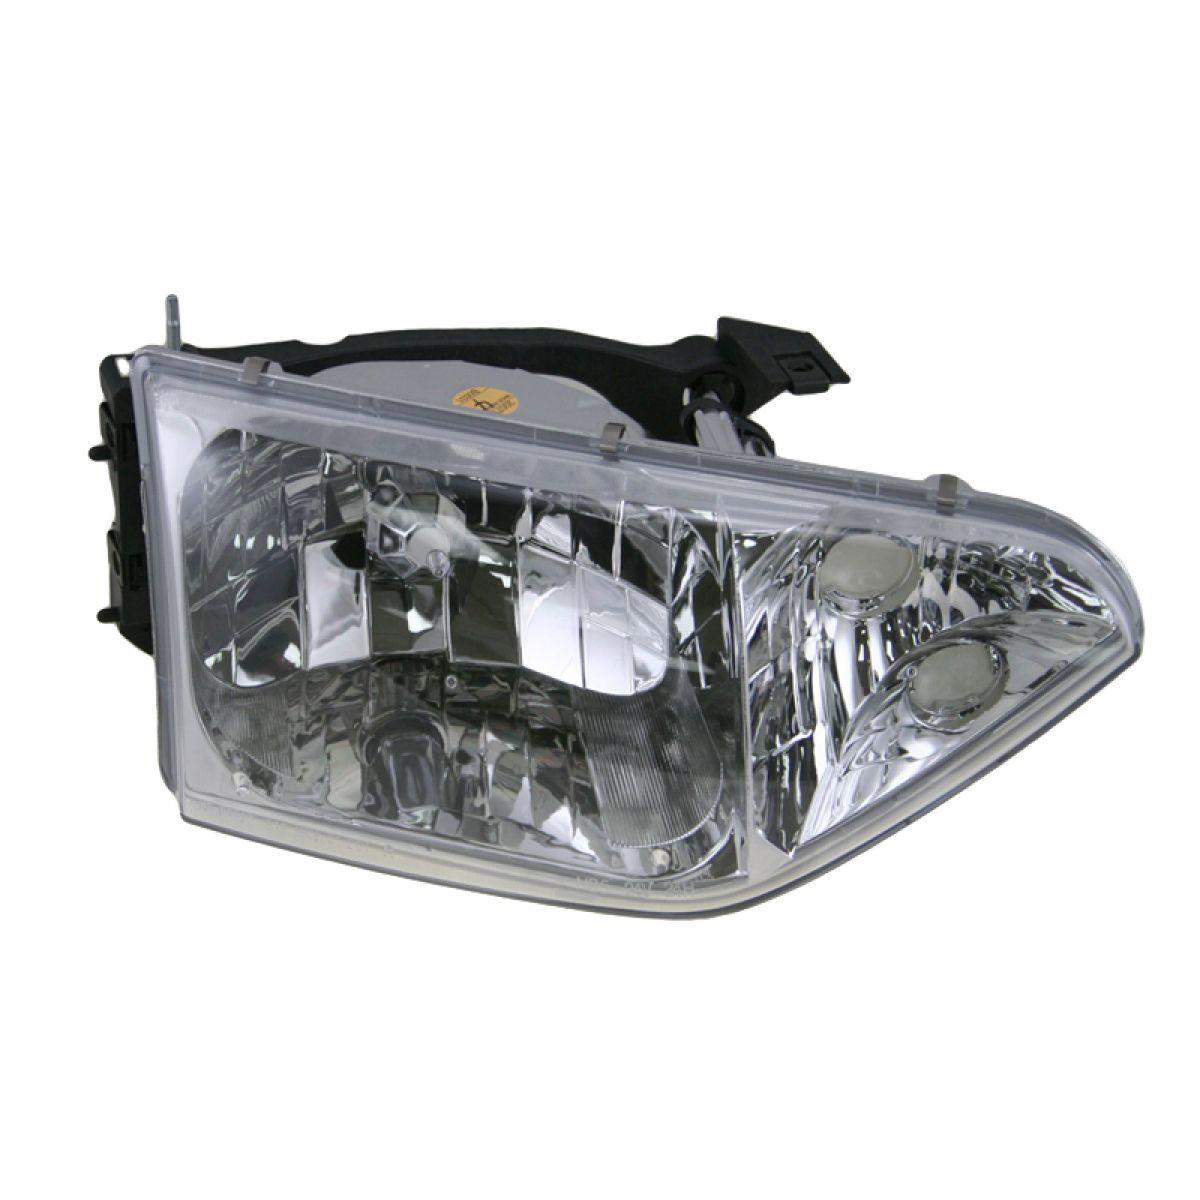 hight resolution of headlight headlamp rh right passenger side for 01 02 headlight switch wiring 2008 nissan quest headlight